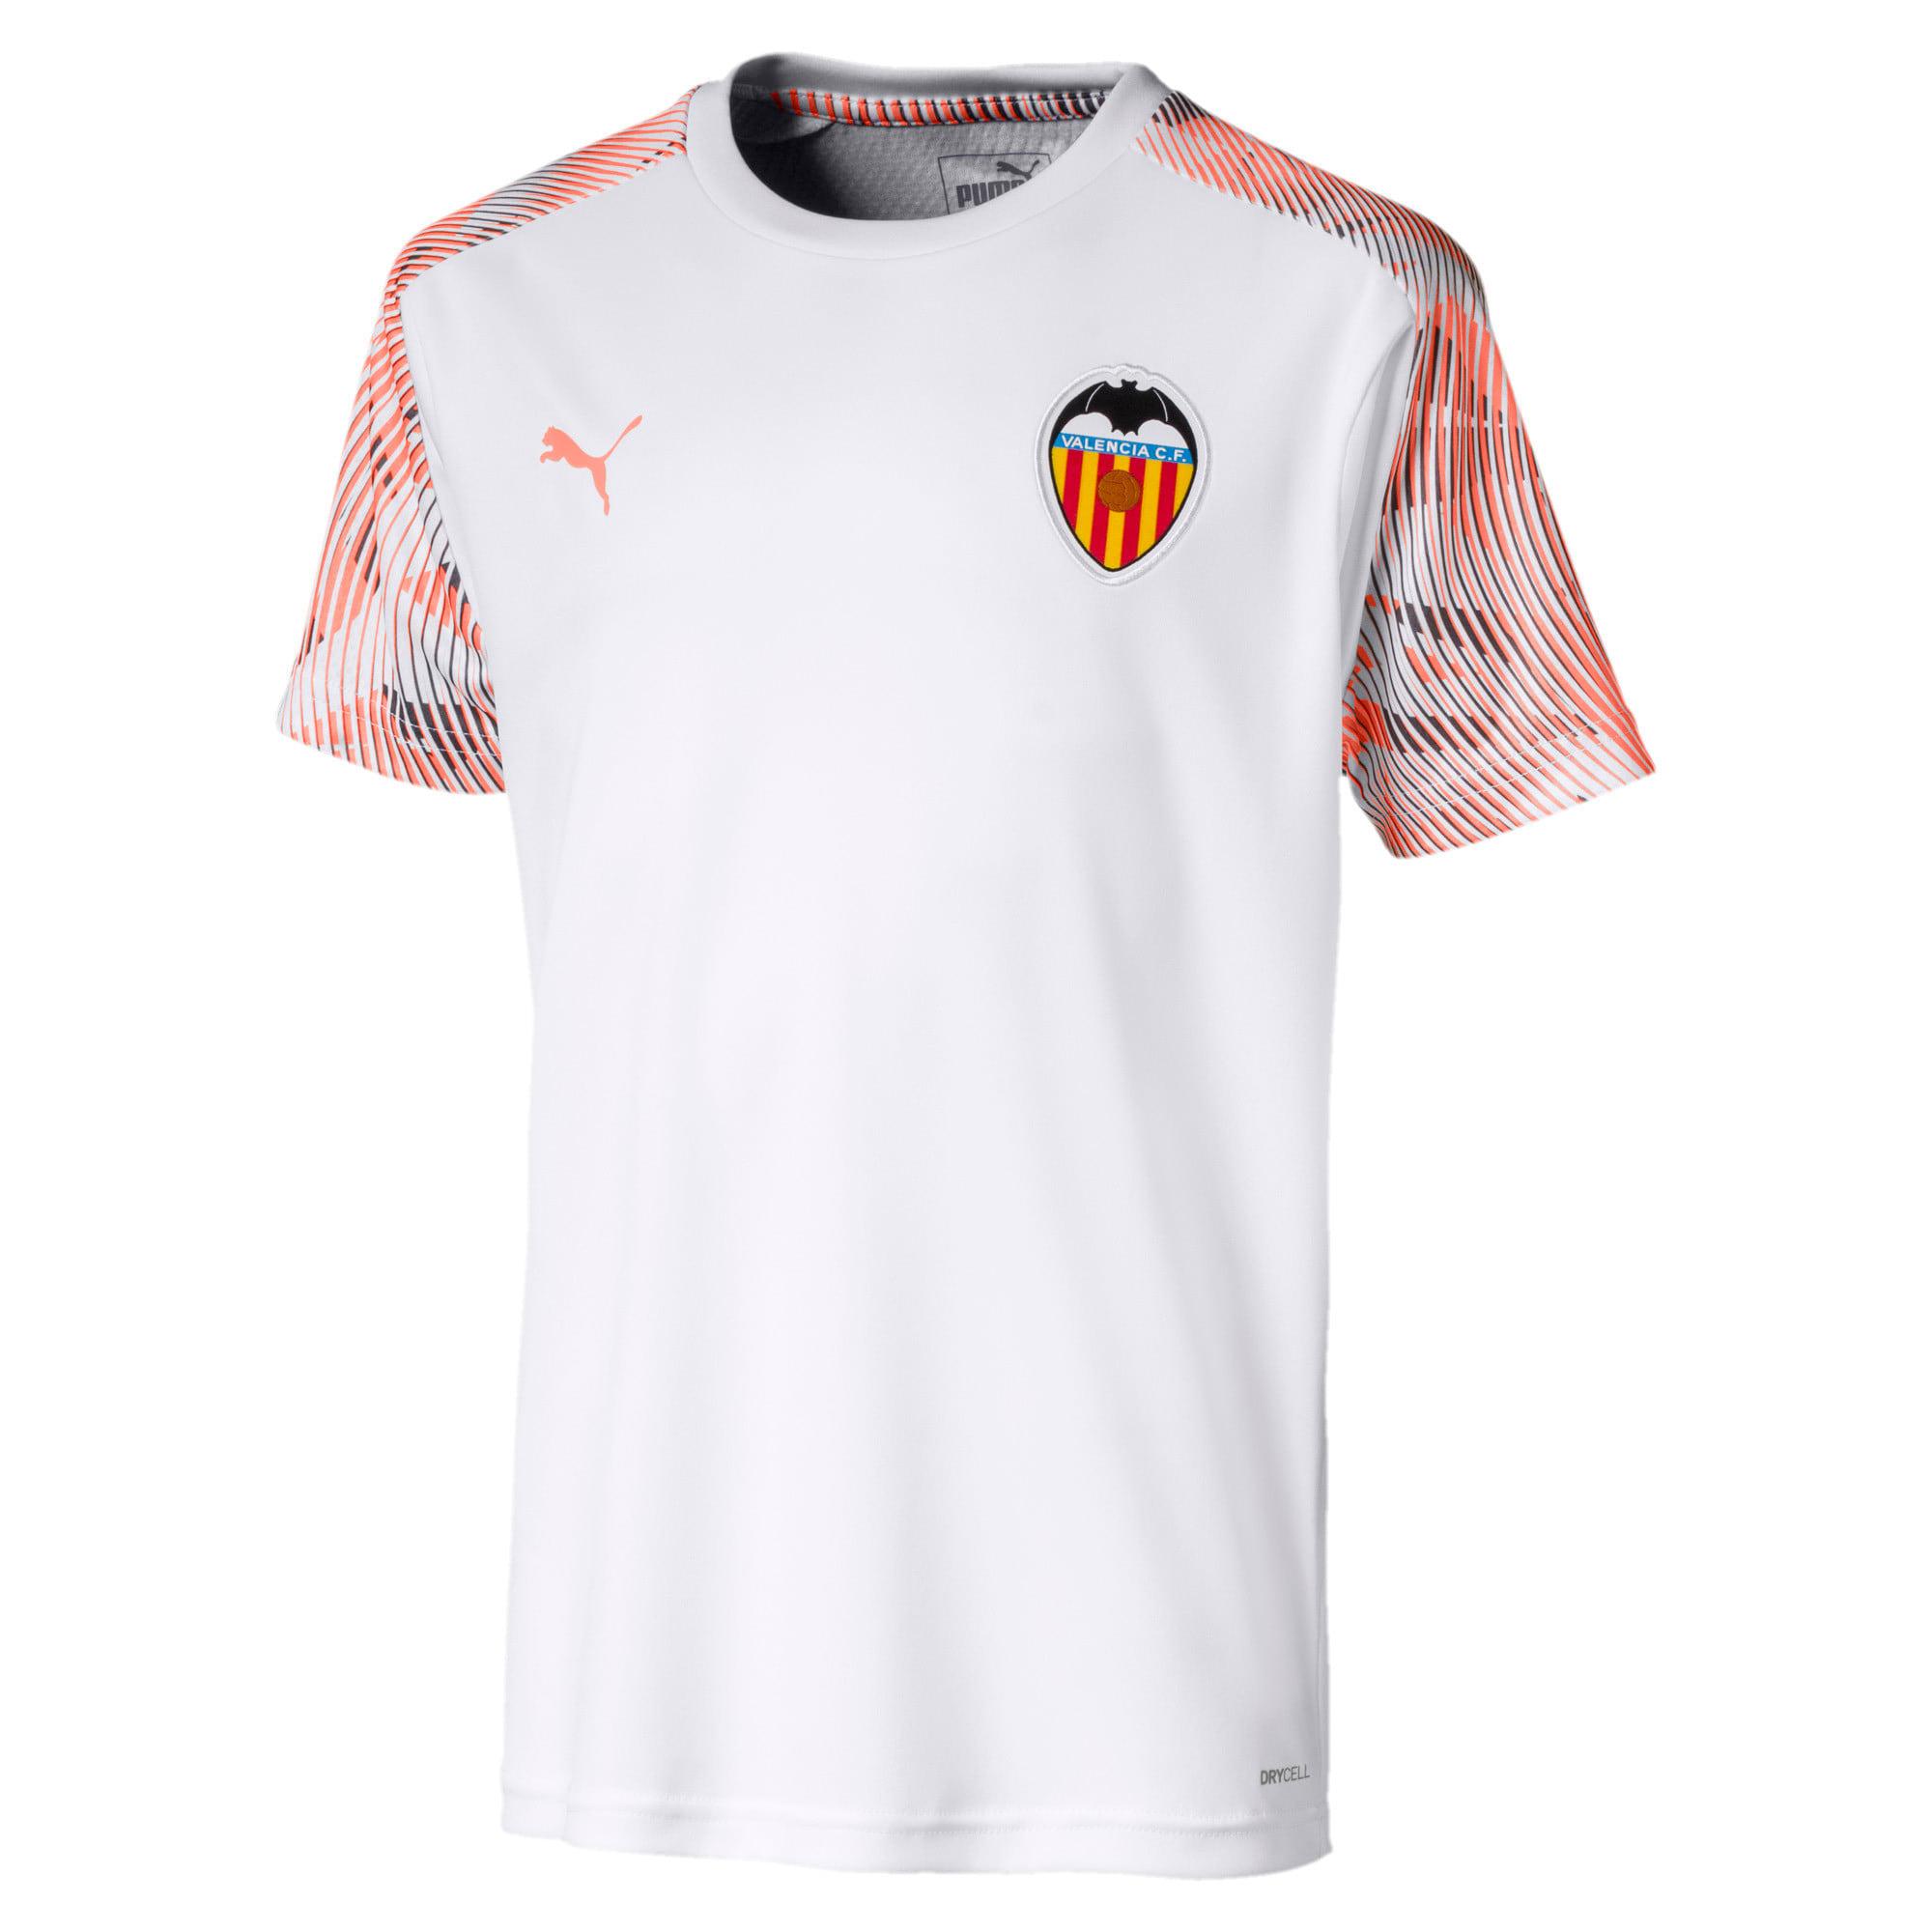 Thumbnail 1 of Valencia CF Kids' Training Jersey, Puma White-Fizzy Orange, medium